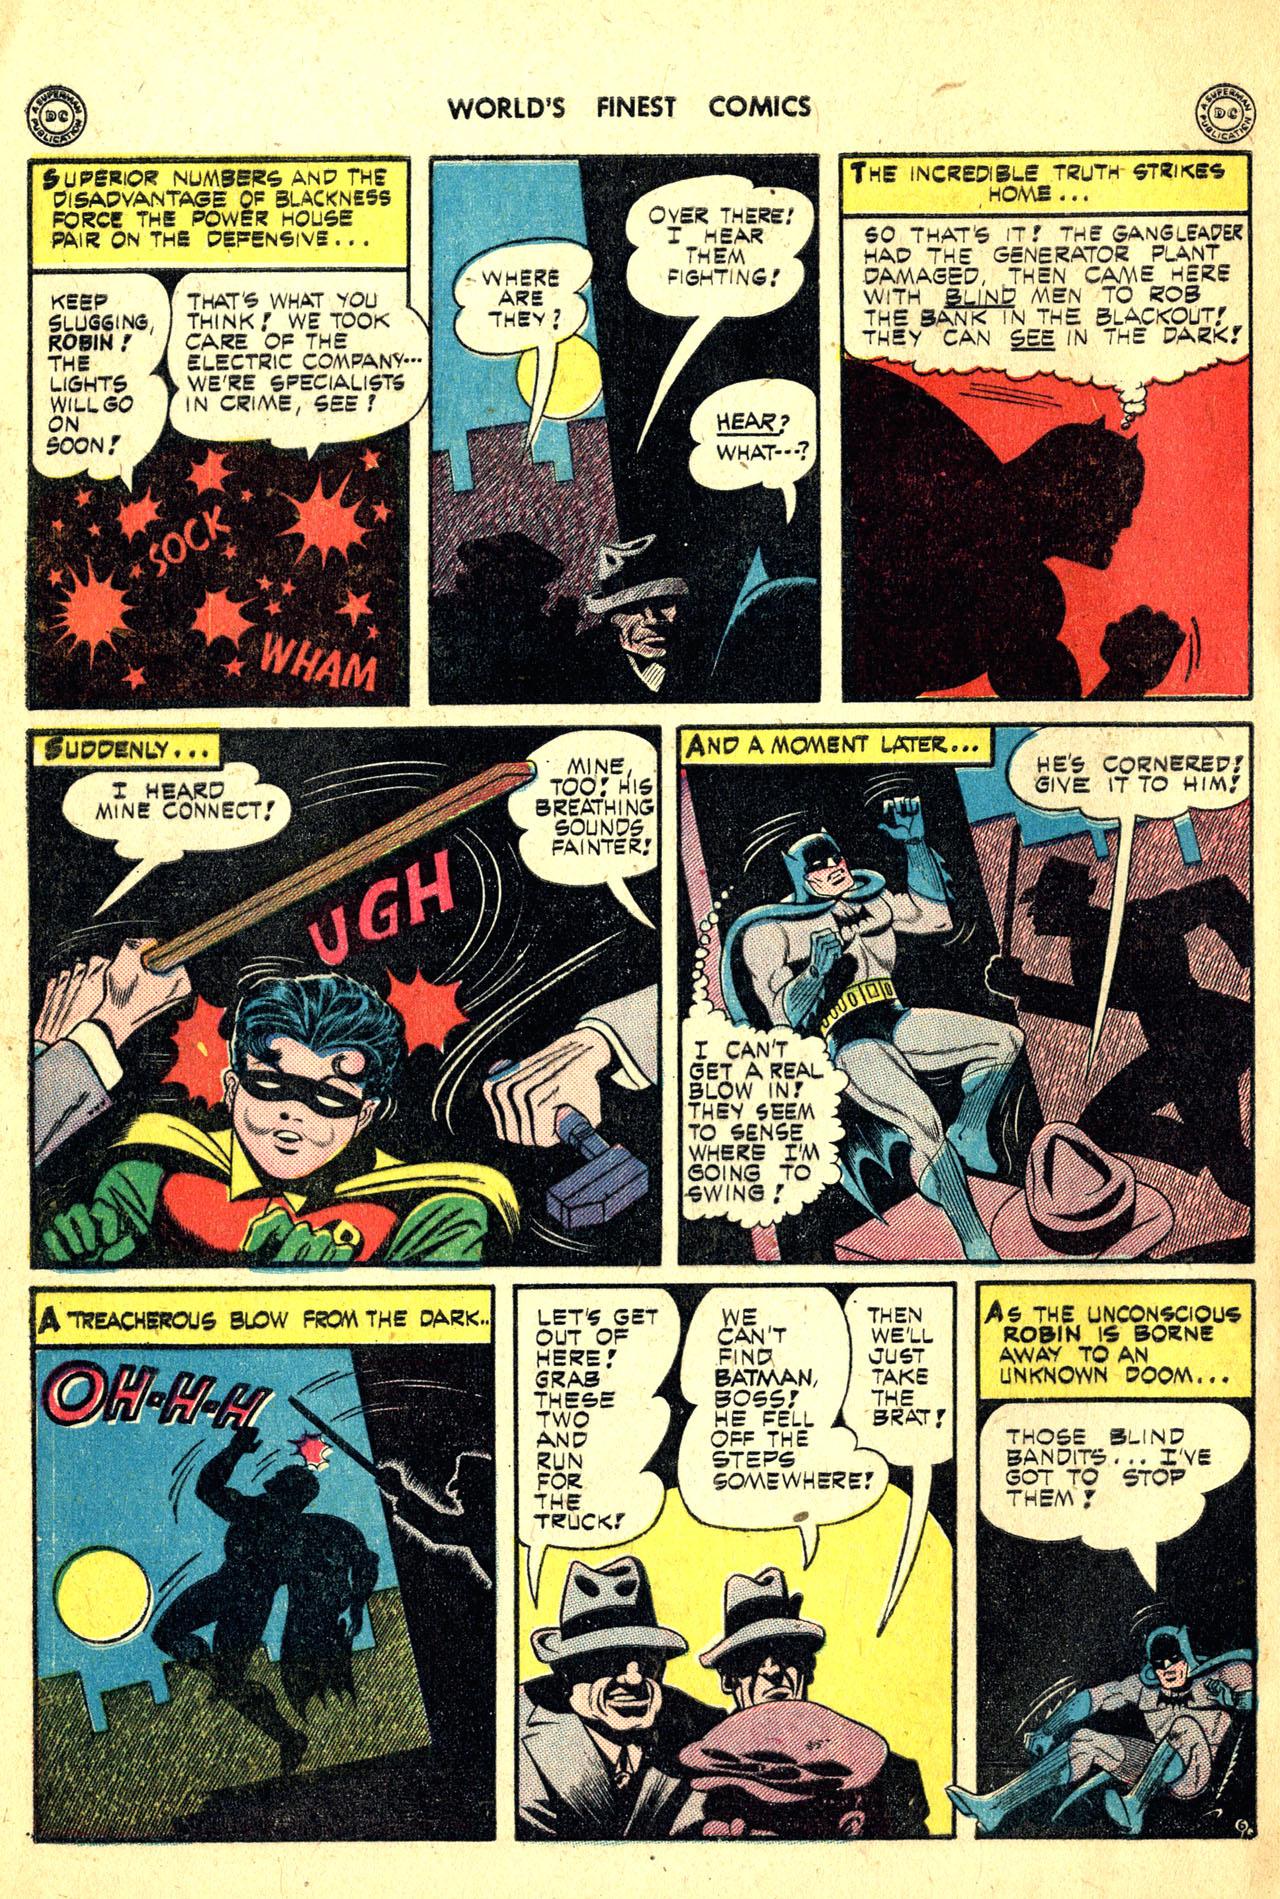 Read online World's Finest Comics comic -  Issue #18 - 74